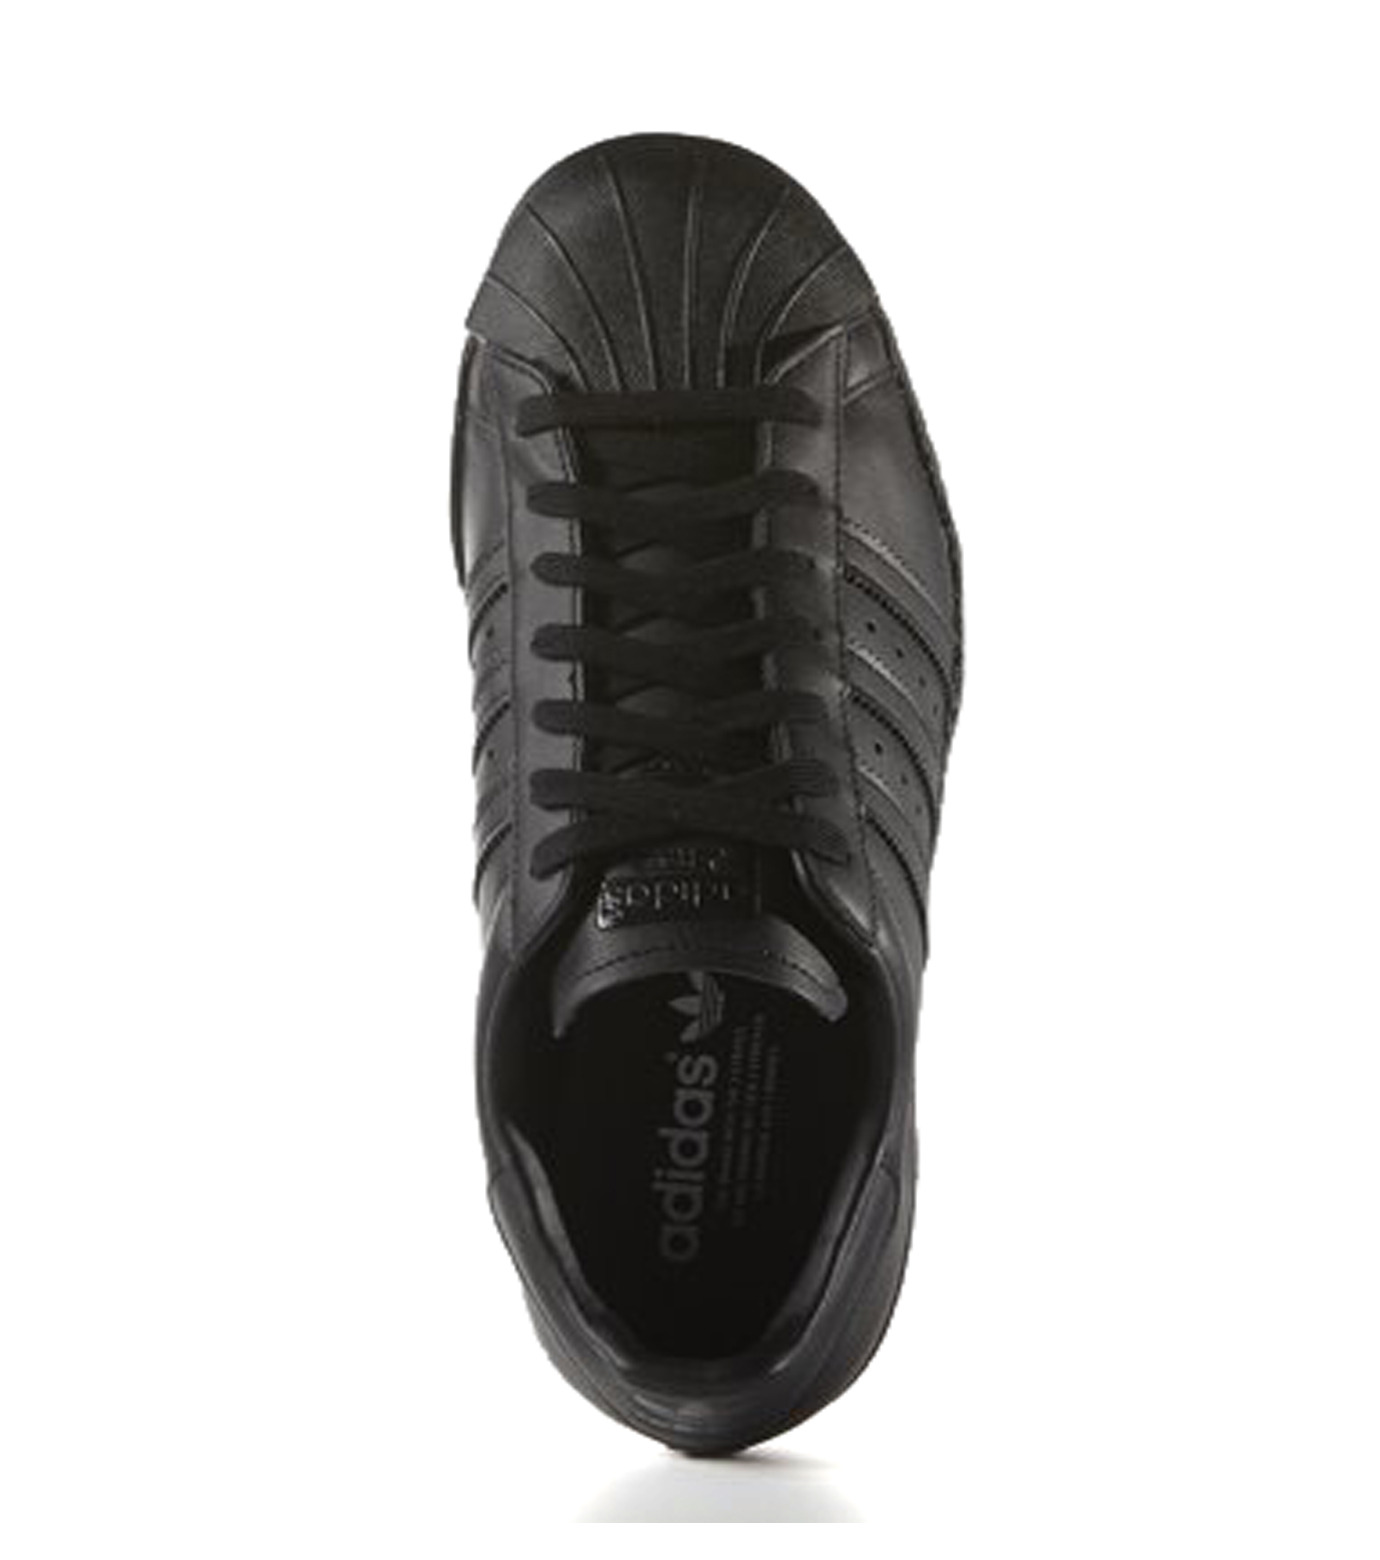 adidas(アディダス)のSUPERSTAR 80s-BLACK(シューズ/shoes)-S79442-13 拡大詳細画像3